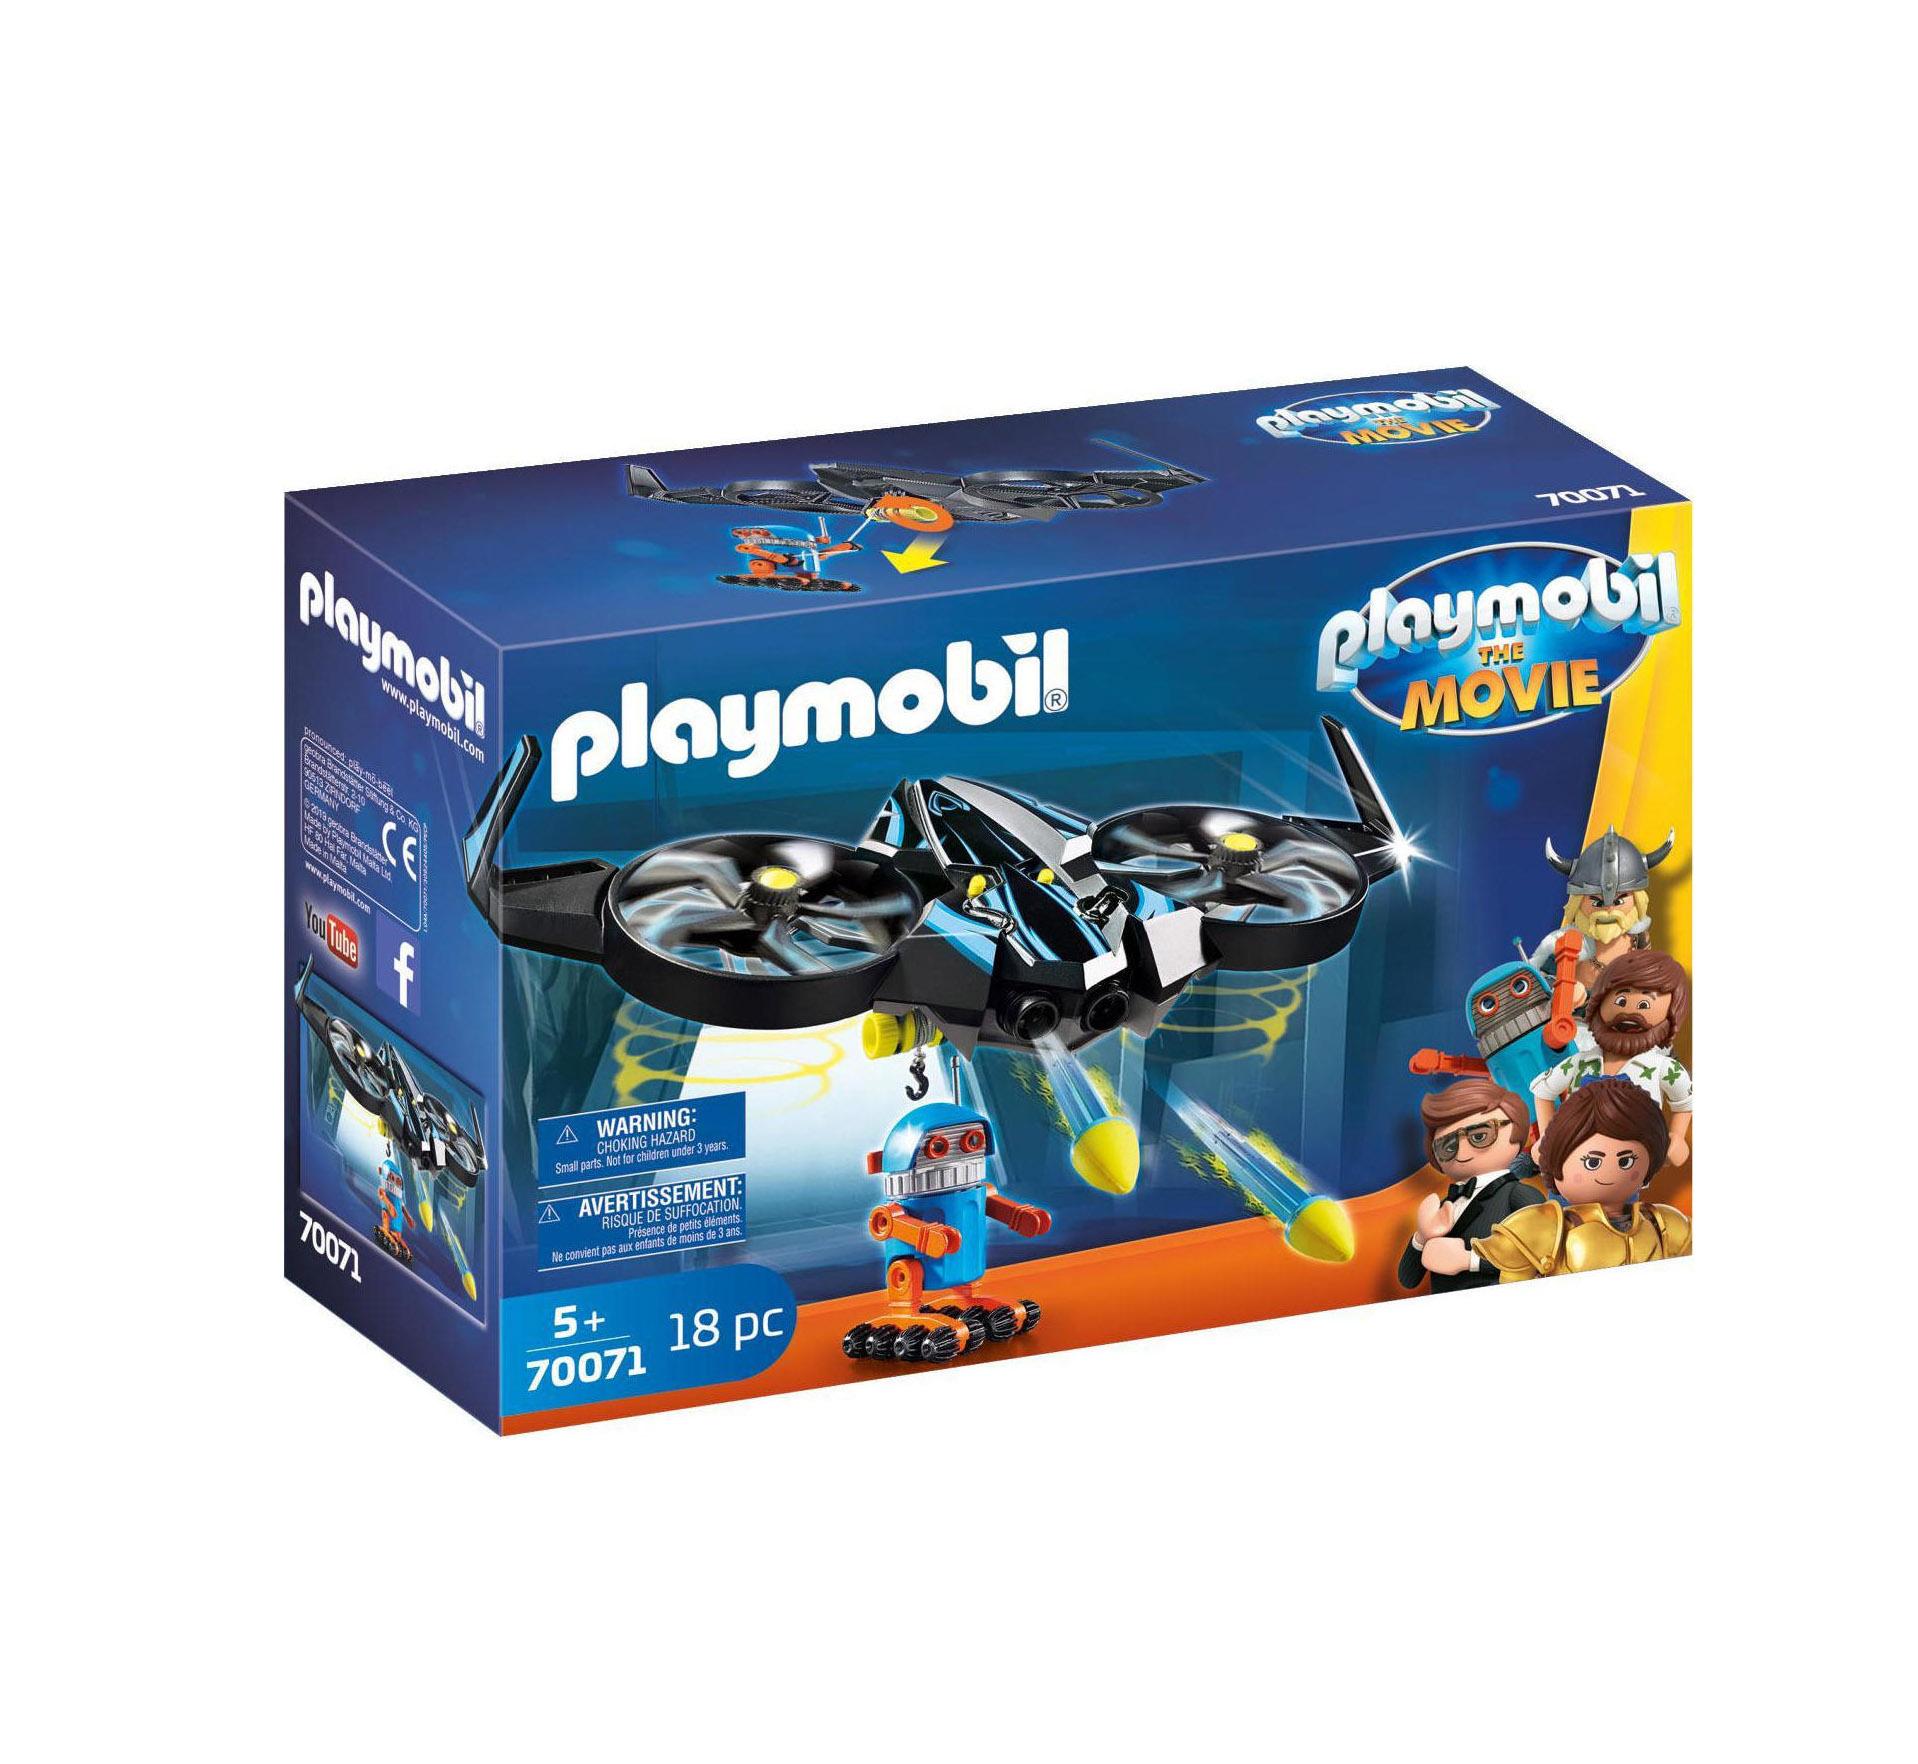 Playmobil The Movie: Robotitron with Drone 70071